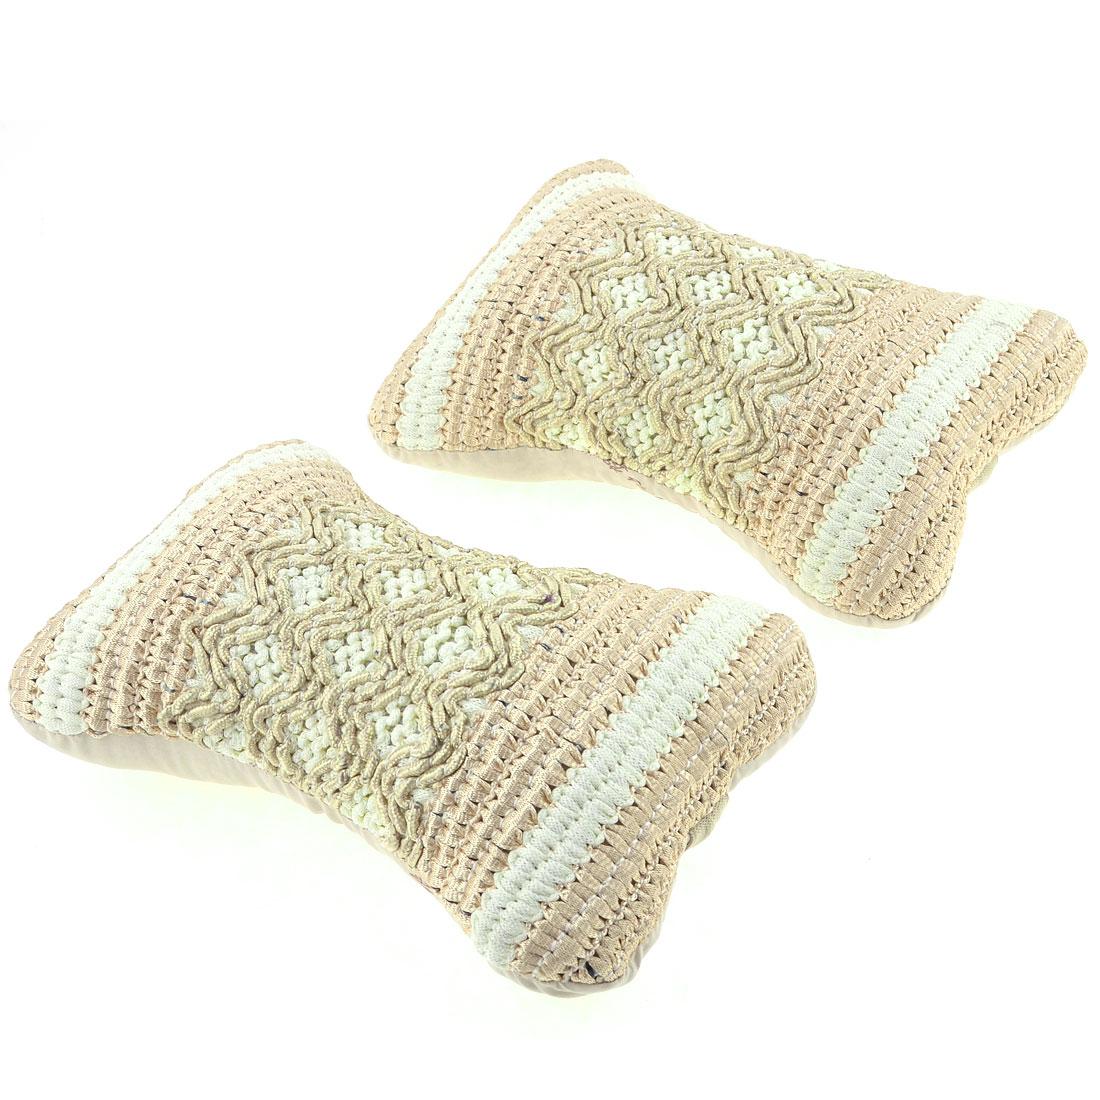 Unique Bargains 2 Pcs Pale Yellow Brown Nylon Knitted Zip Up Neck Rest Pillow for Automobile Car